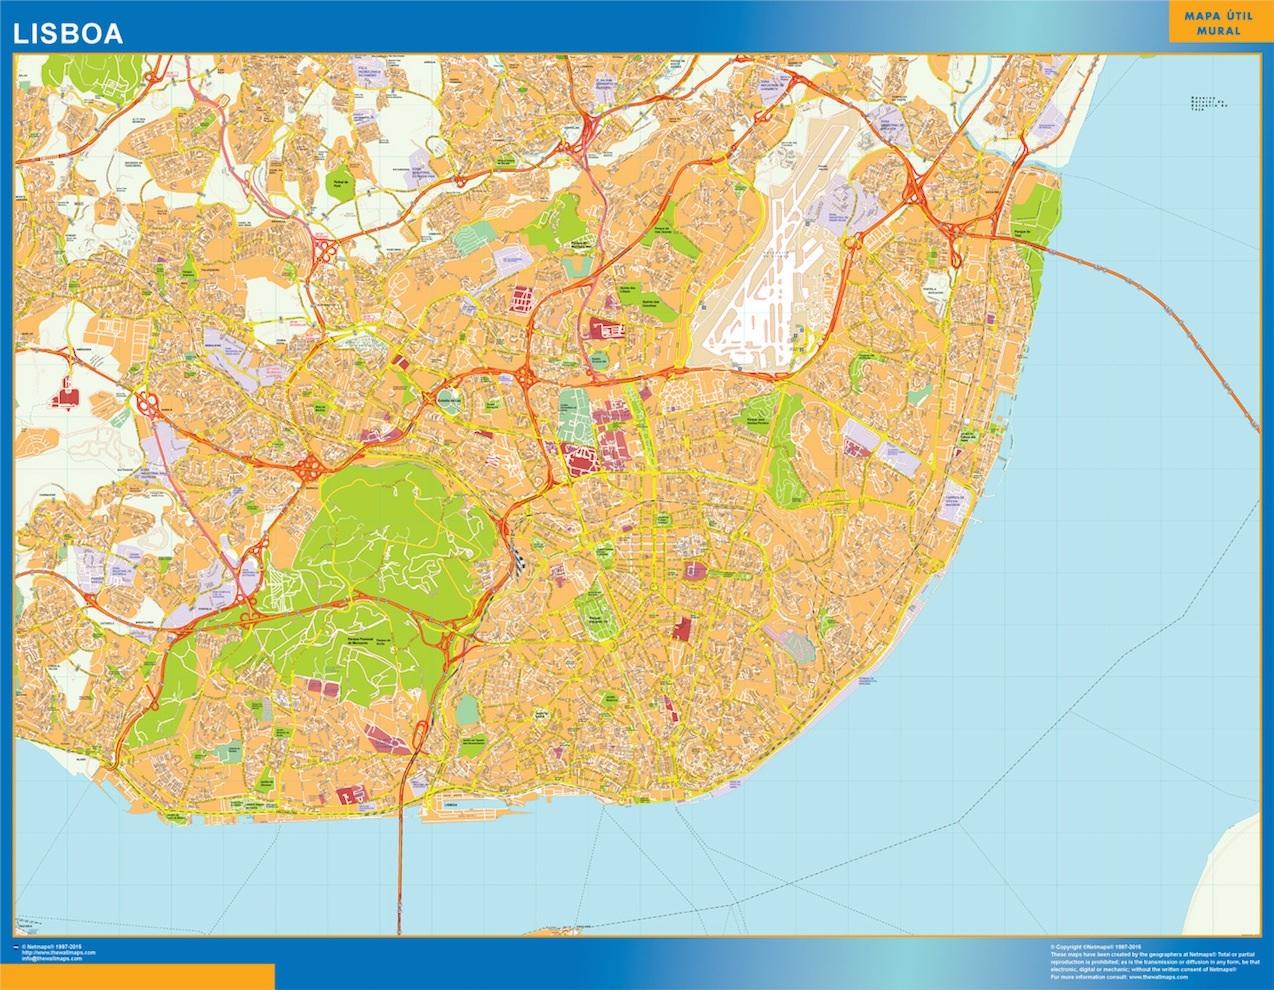 Mapa Lisboa en Portugal plastificado gigante